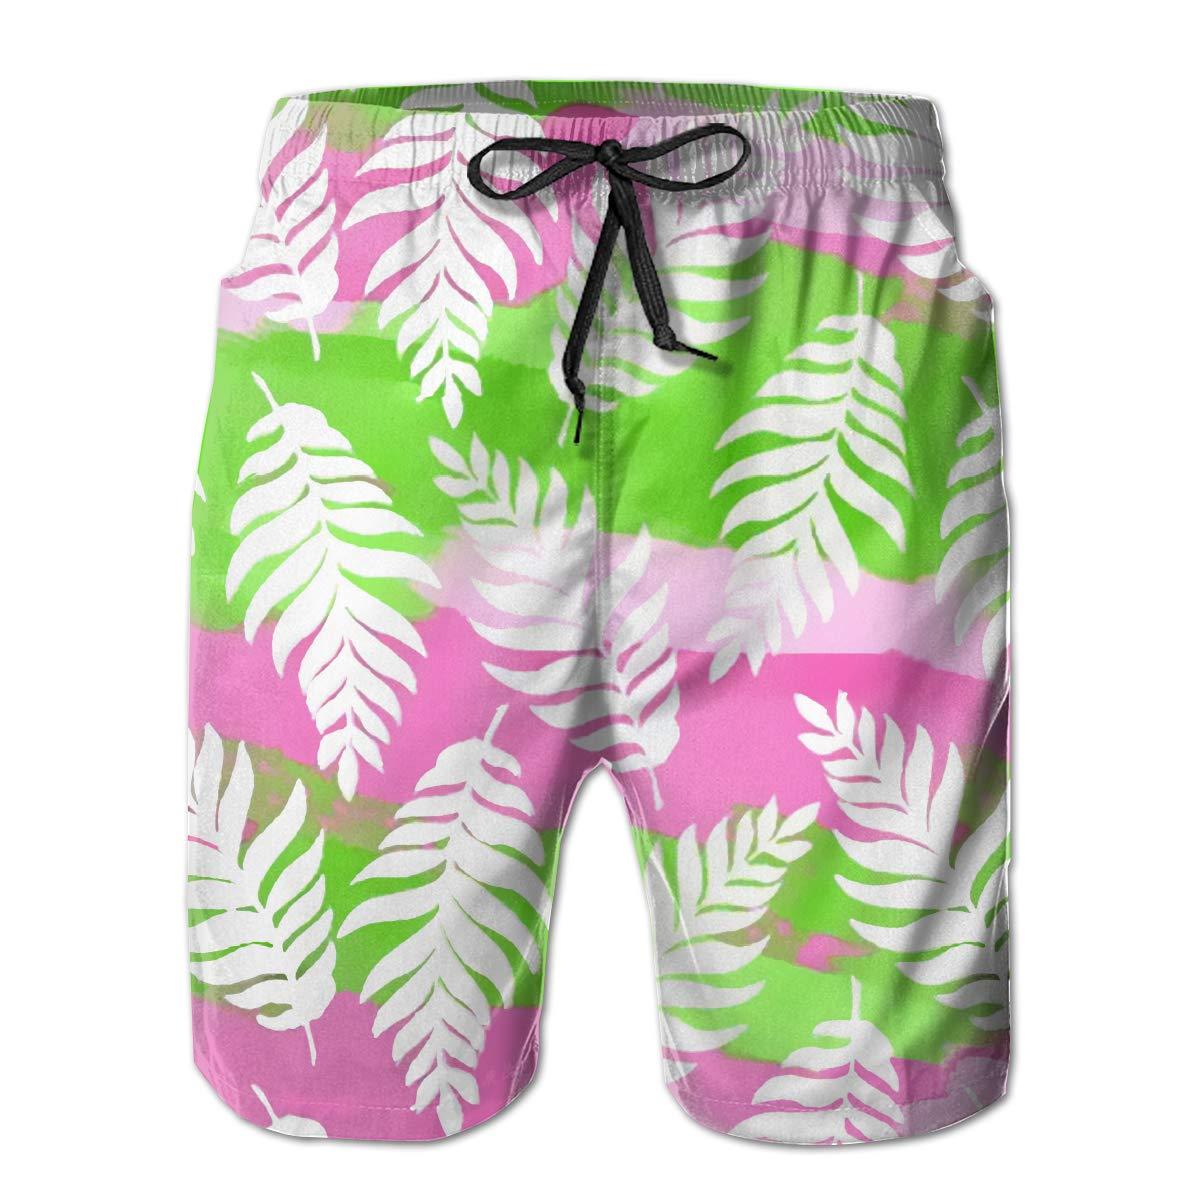 Airealy Men/¡/¯s Summer Beach Trunks Leaf Drawstring Elastic Waist Quick Dry Surfing Beach Board Shorts